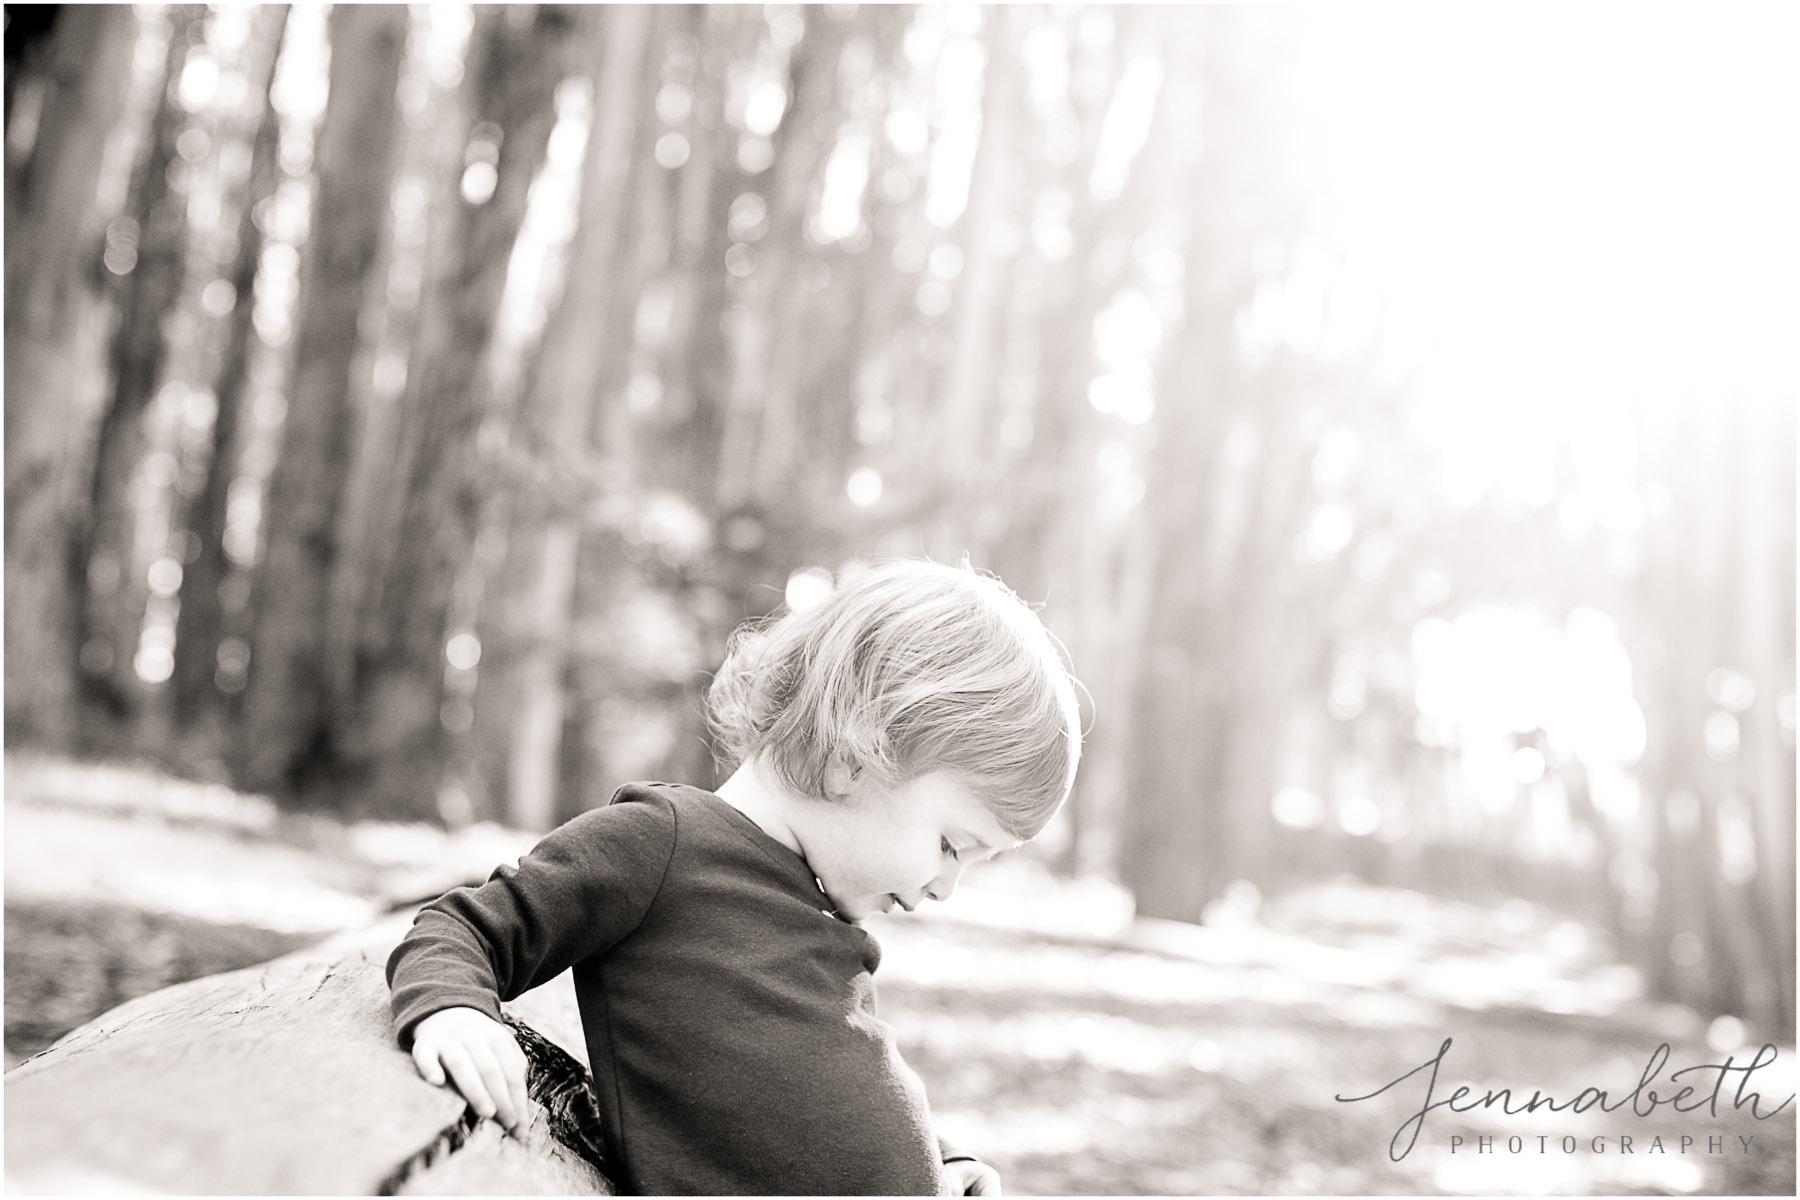 JennaBethPhotography-Gendreau-2.jpg